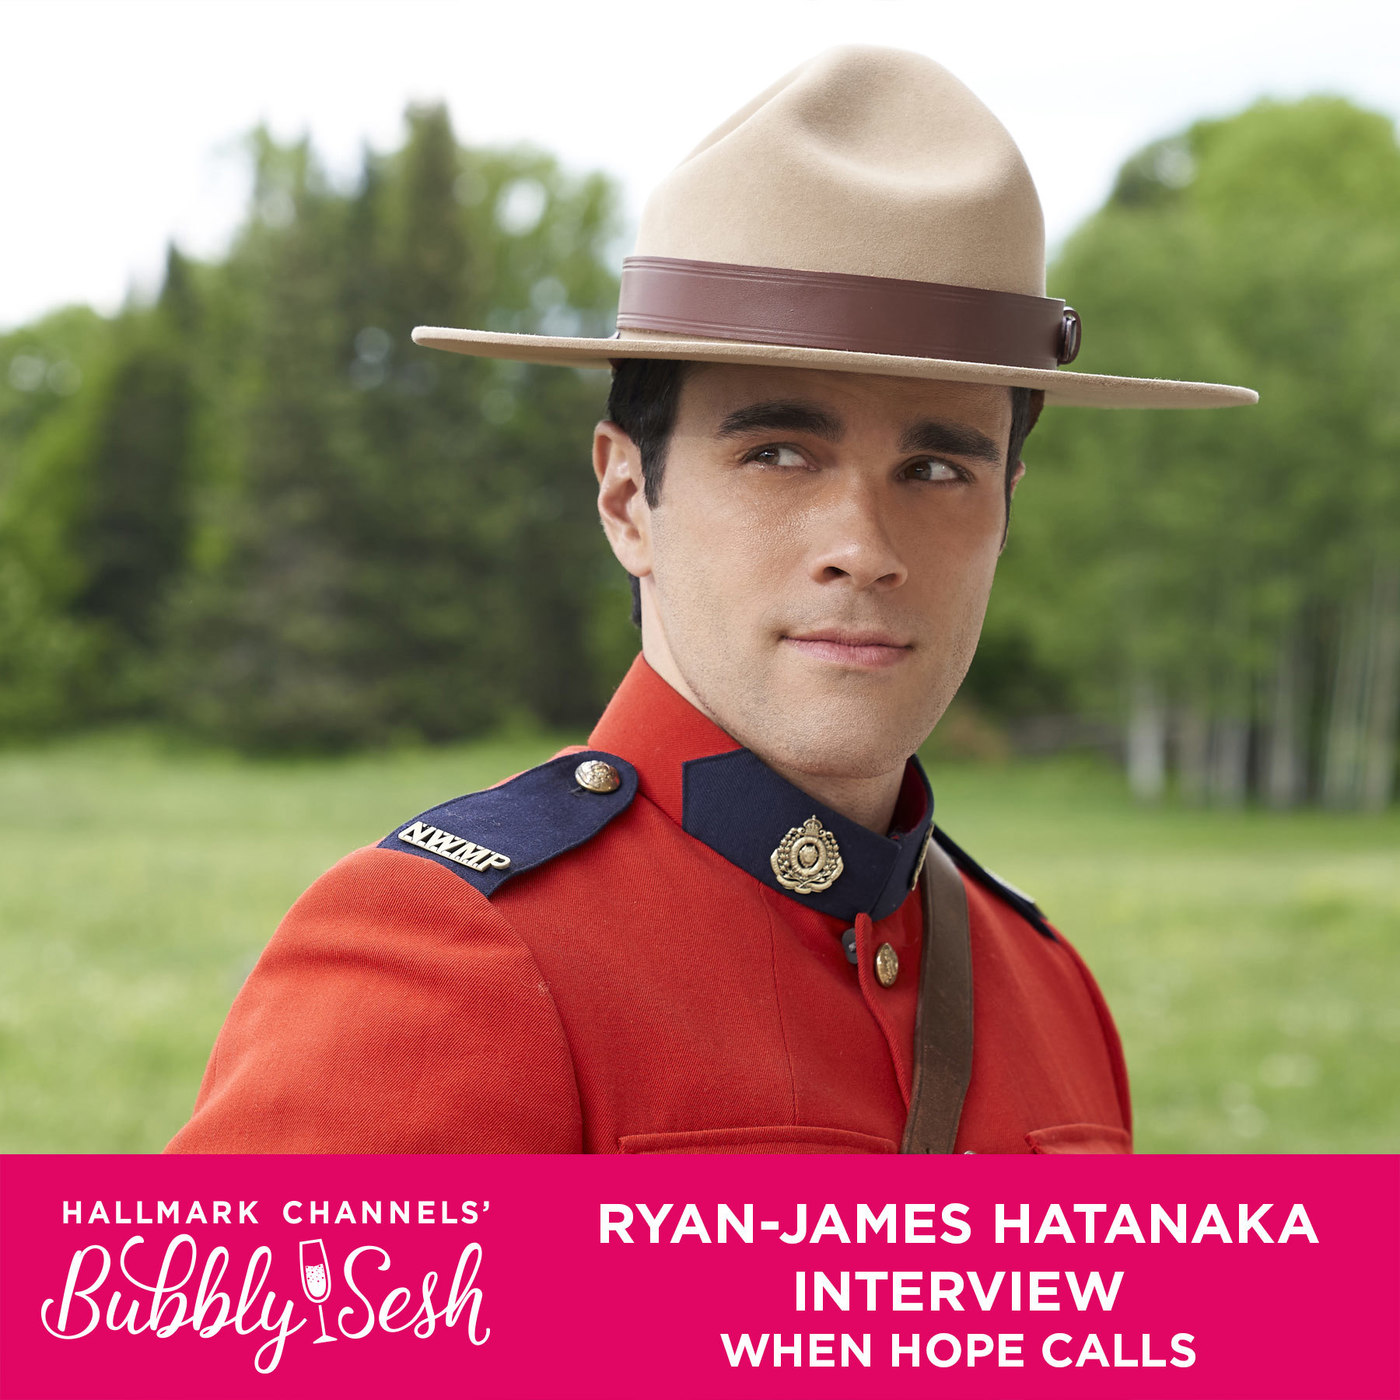 Ryan-James Hatanaka Interview, When Hope Calls